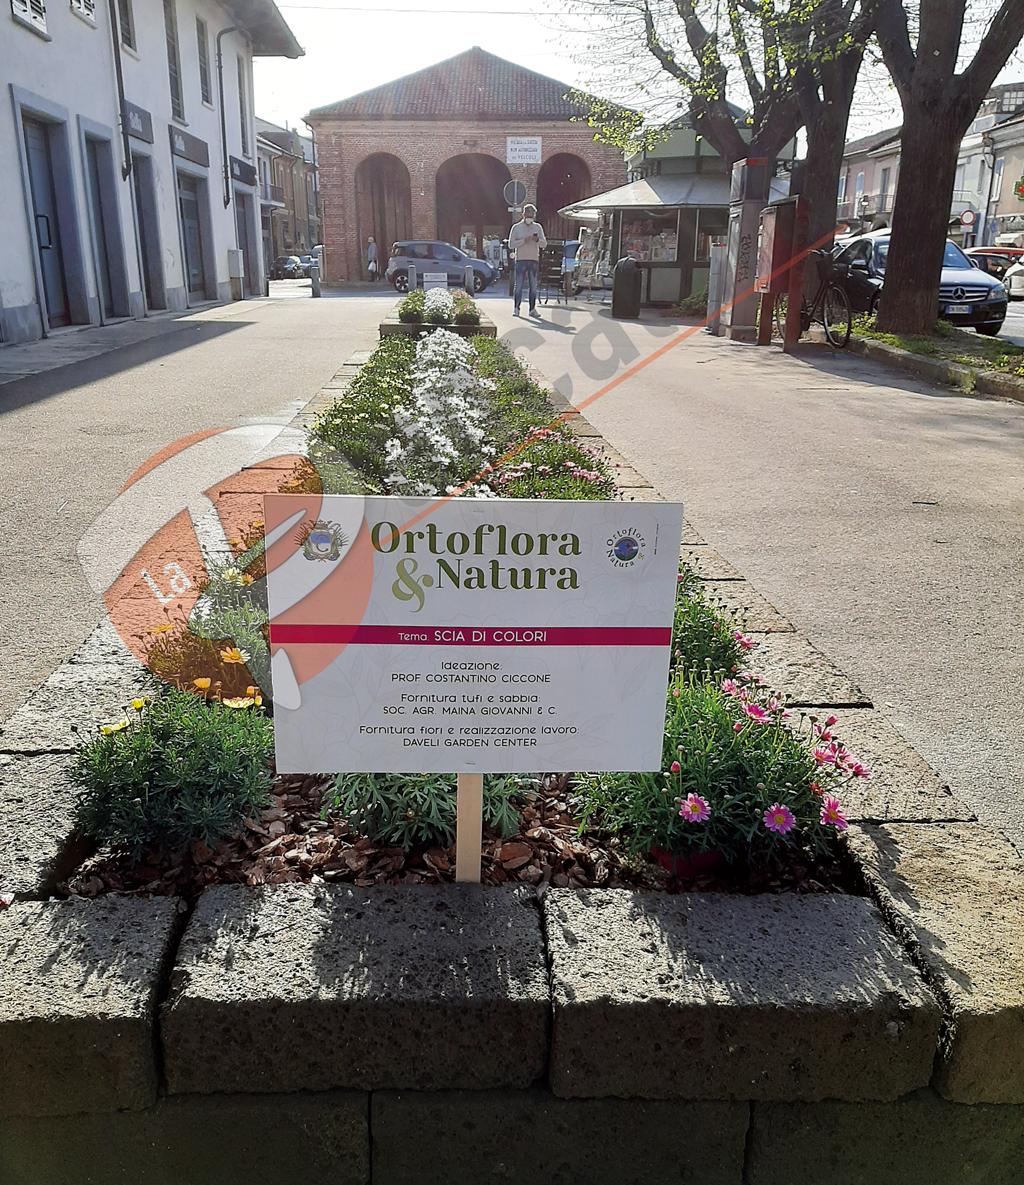 Salta Ortoflora, ma Carmagnola celebra l'evento con aiuole fiorite